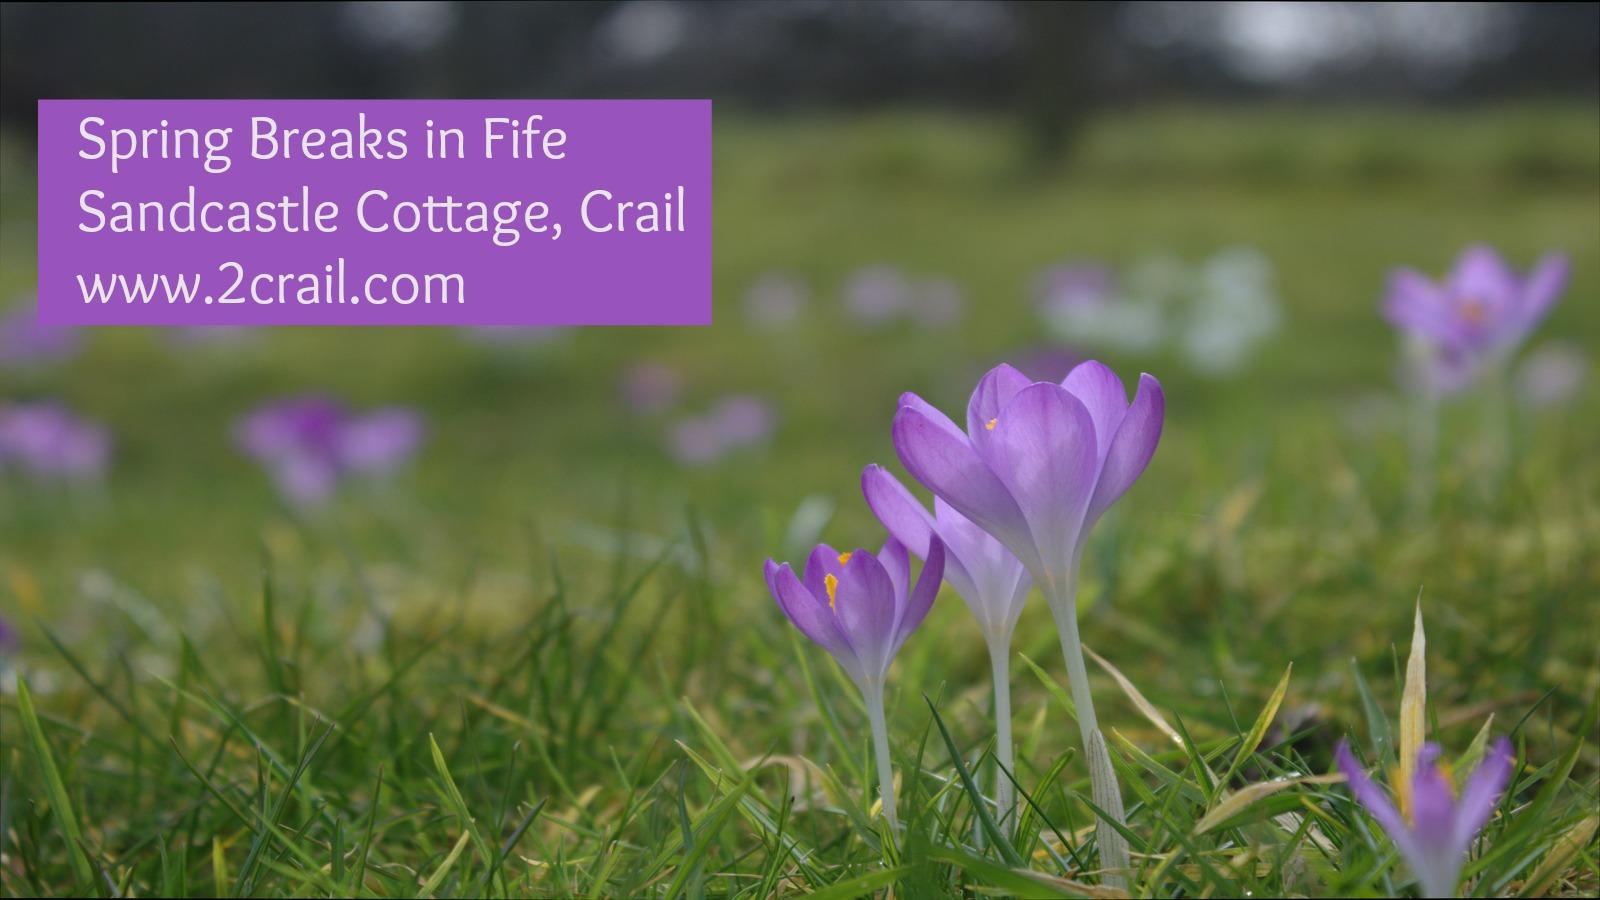 Spring Breaks in Crail